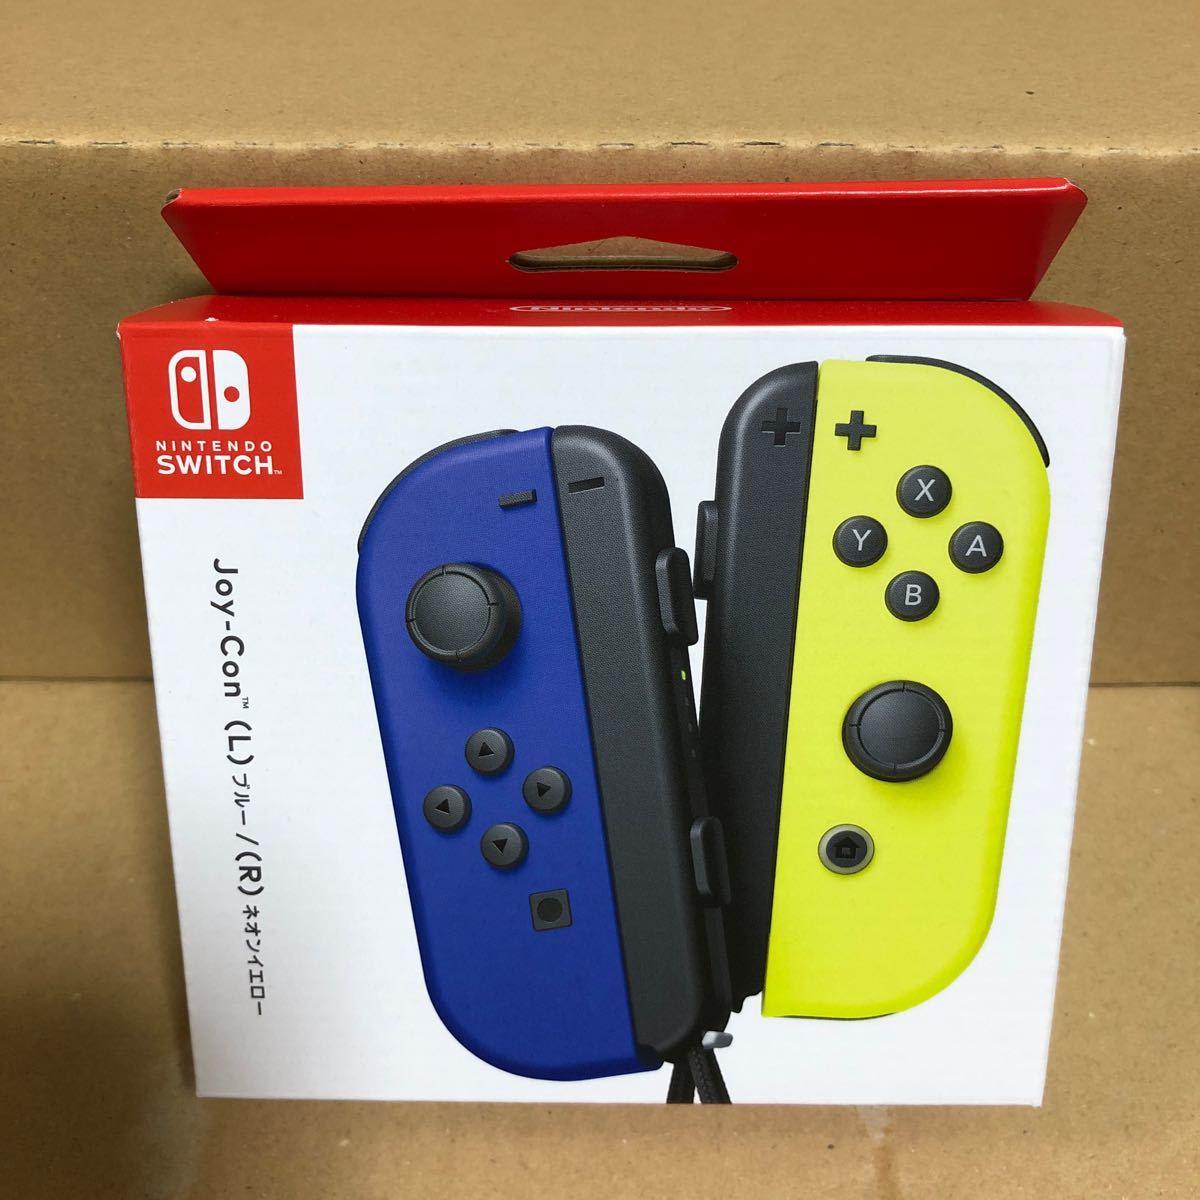 Nintendo Switch ジョイコン ブルー ネオンイエロー